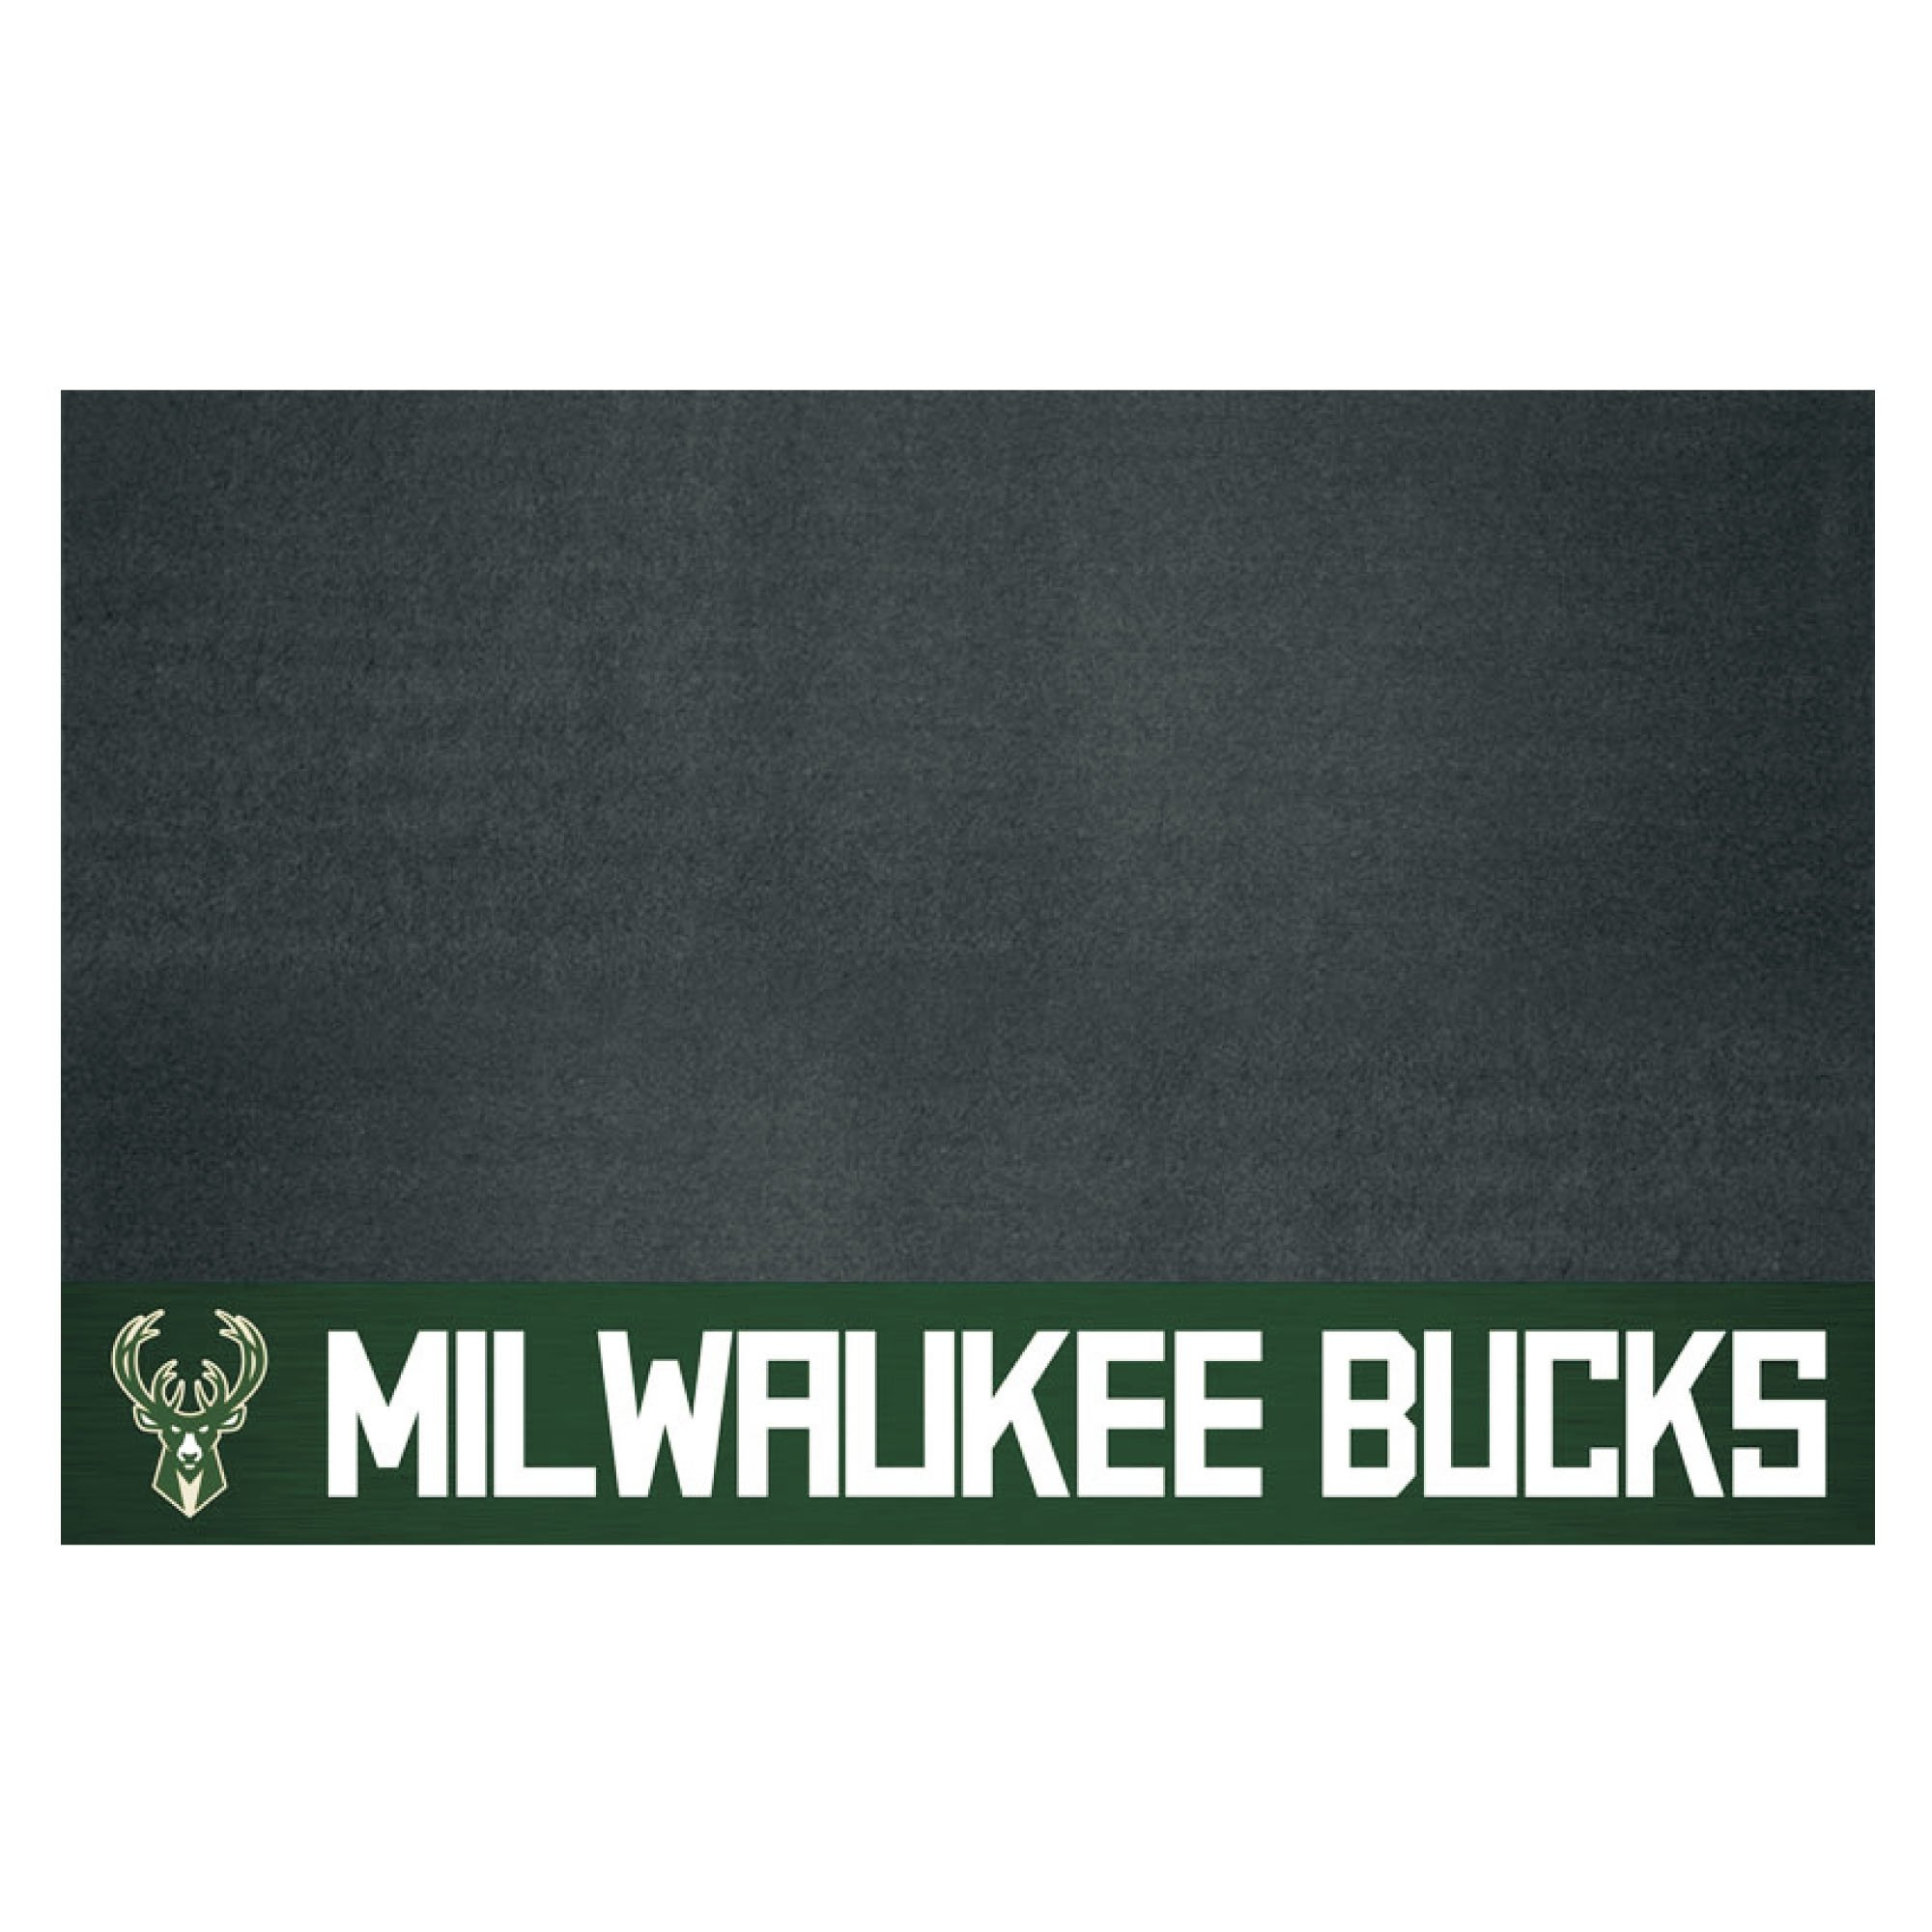 FANMATS 14211 NBA Milwaukee Bucks Grill Mat by Fanmats